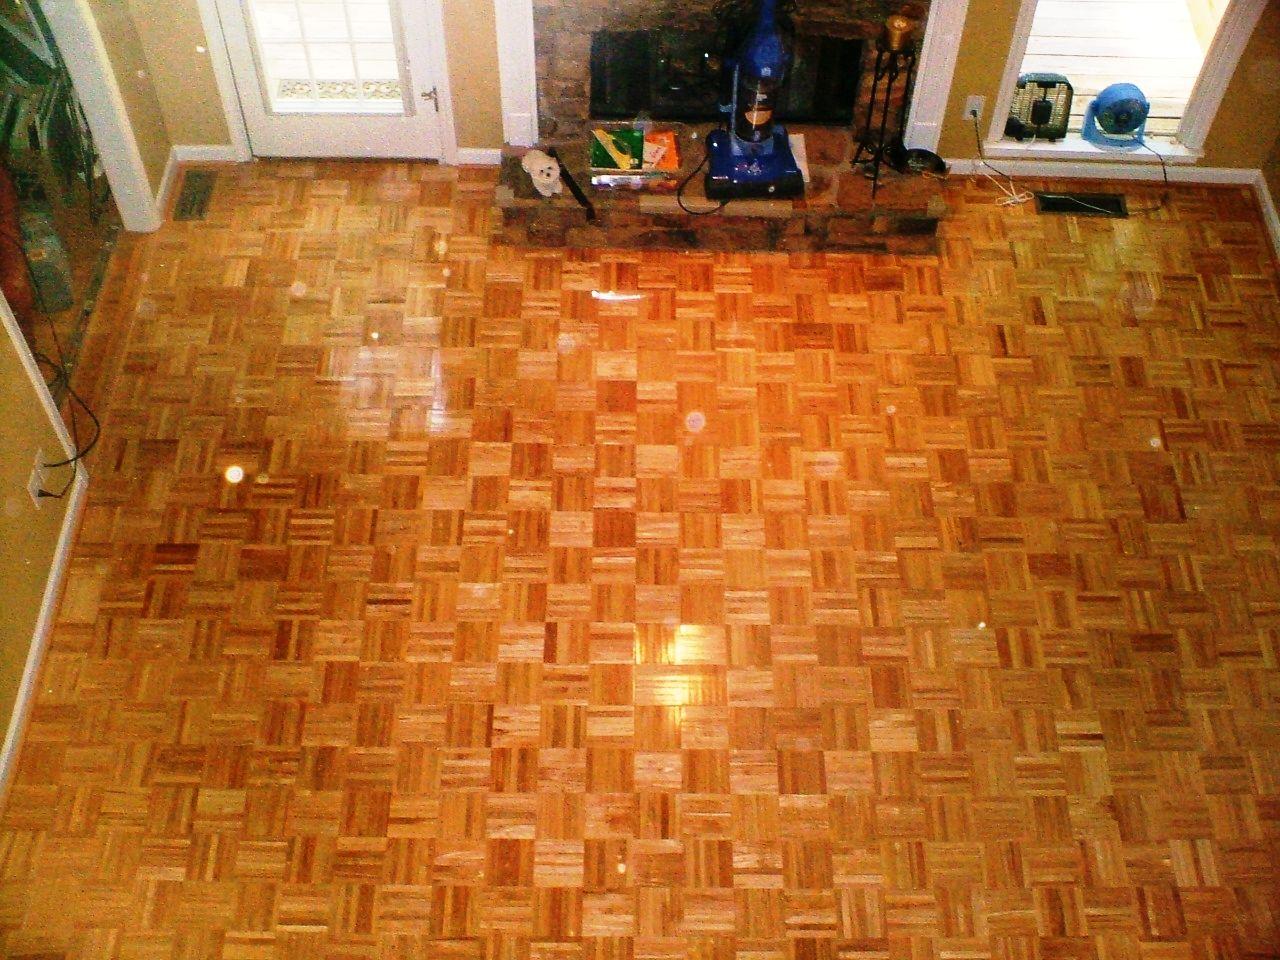 floor restore how parkay flooring parquet to refinishing image xps mega floors of